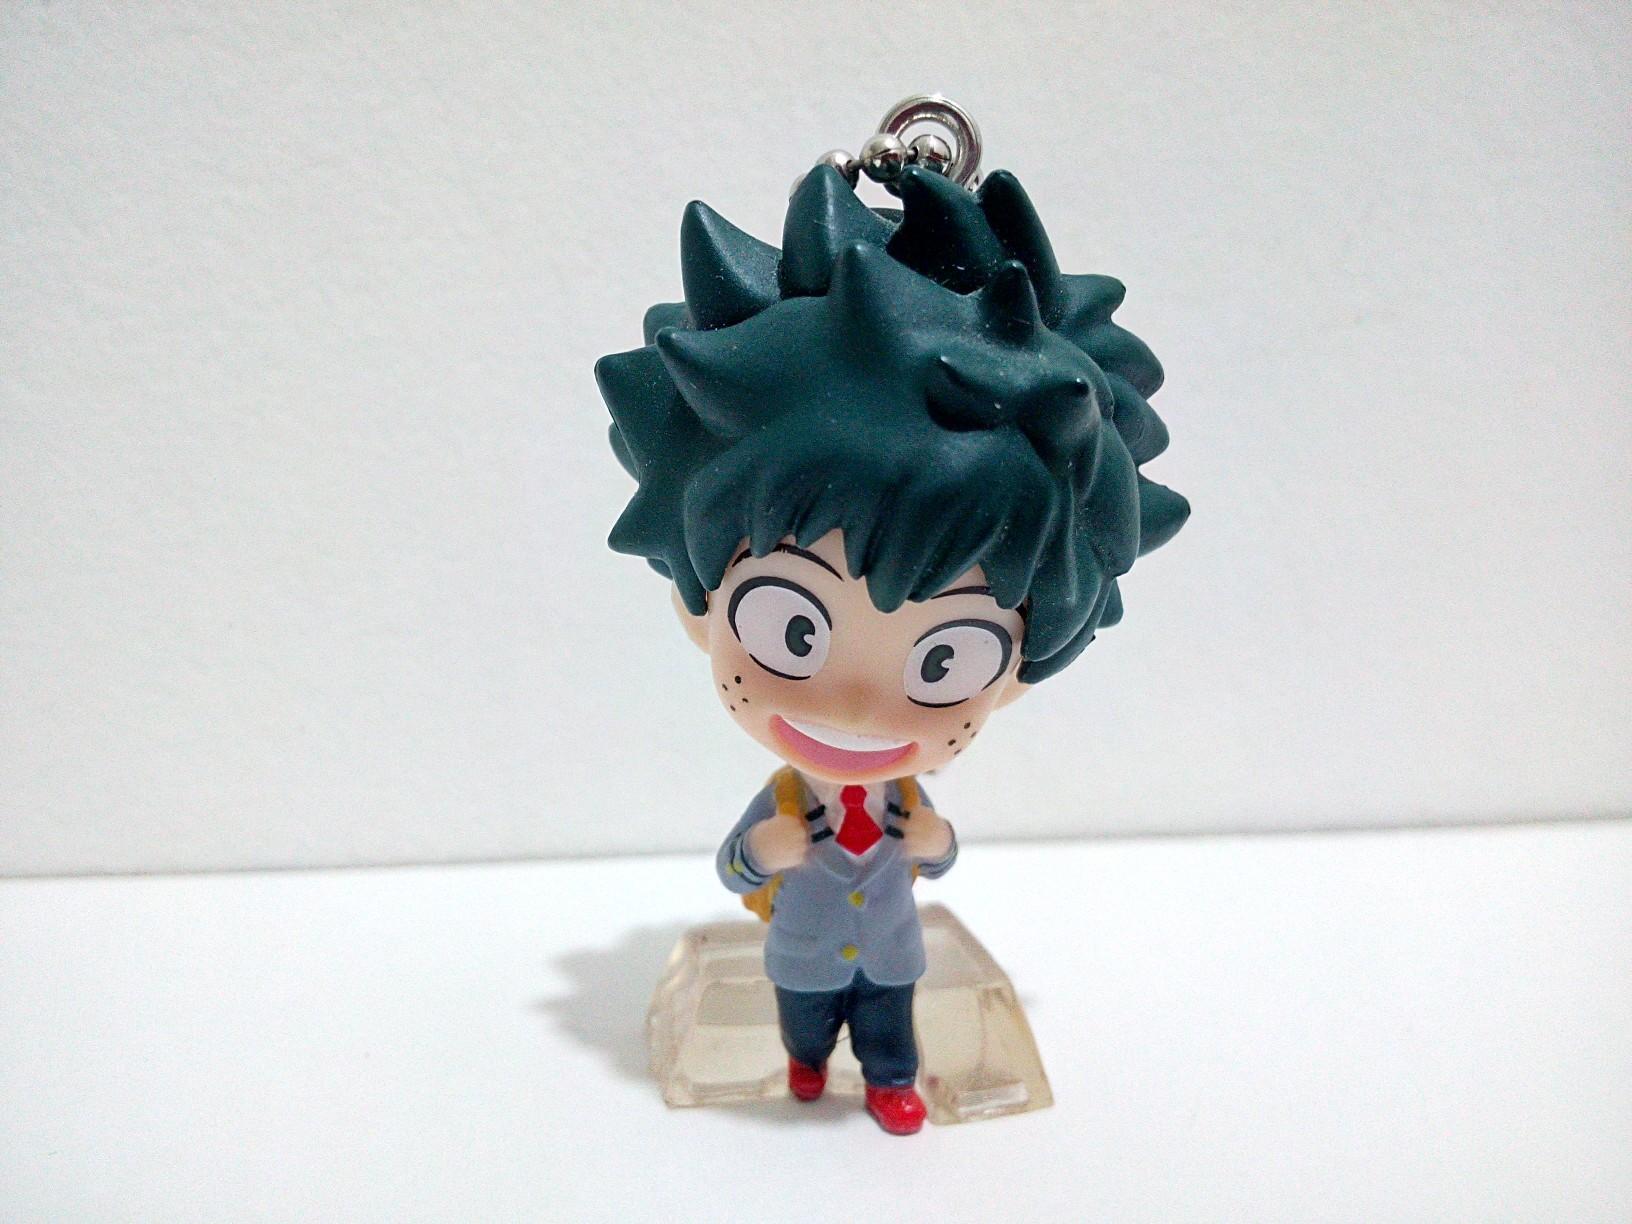 Midoriya Izuku figurine keychain Deku Boku no Hero Academia My Hero Academia Official